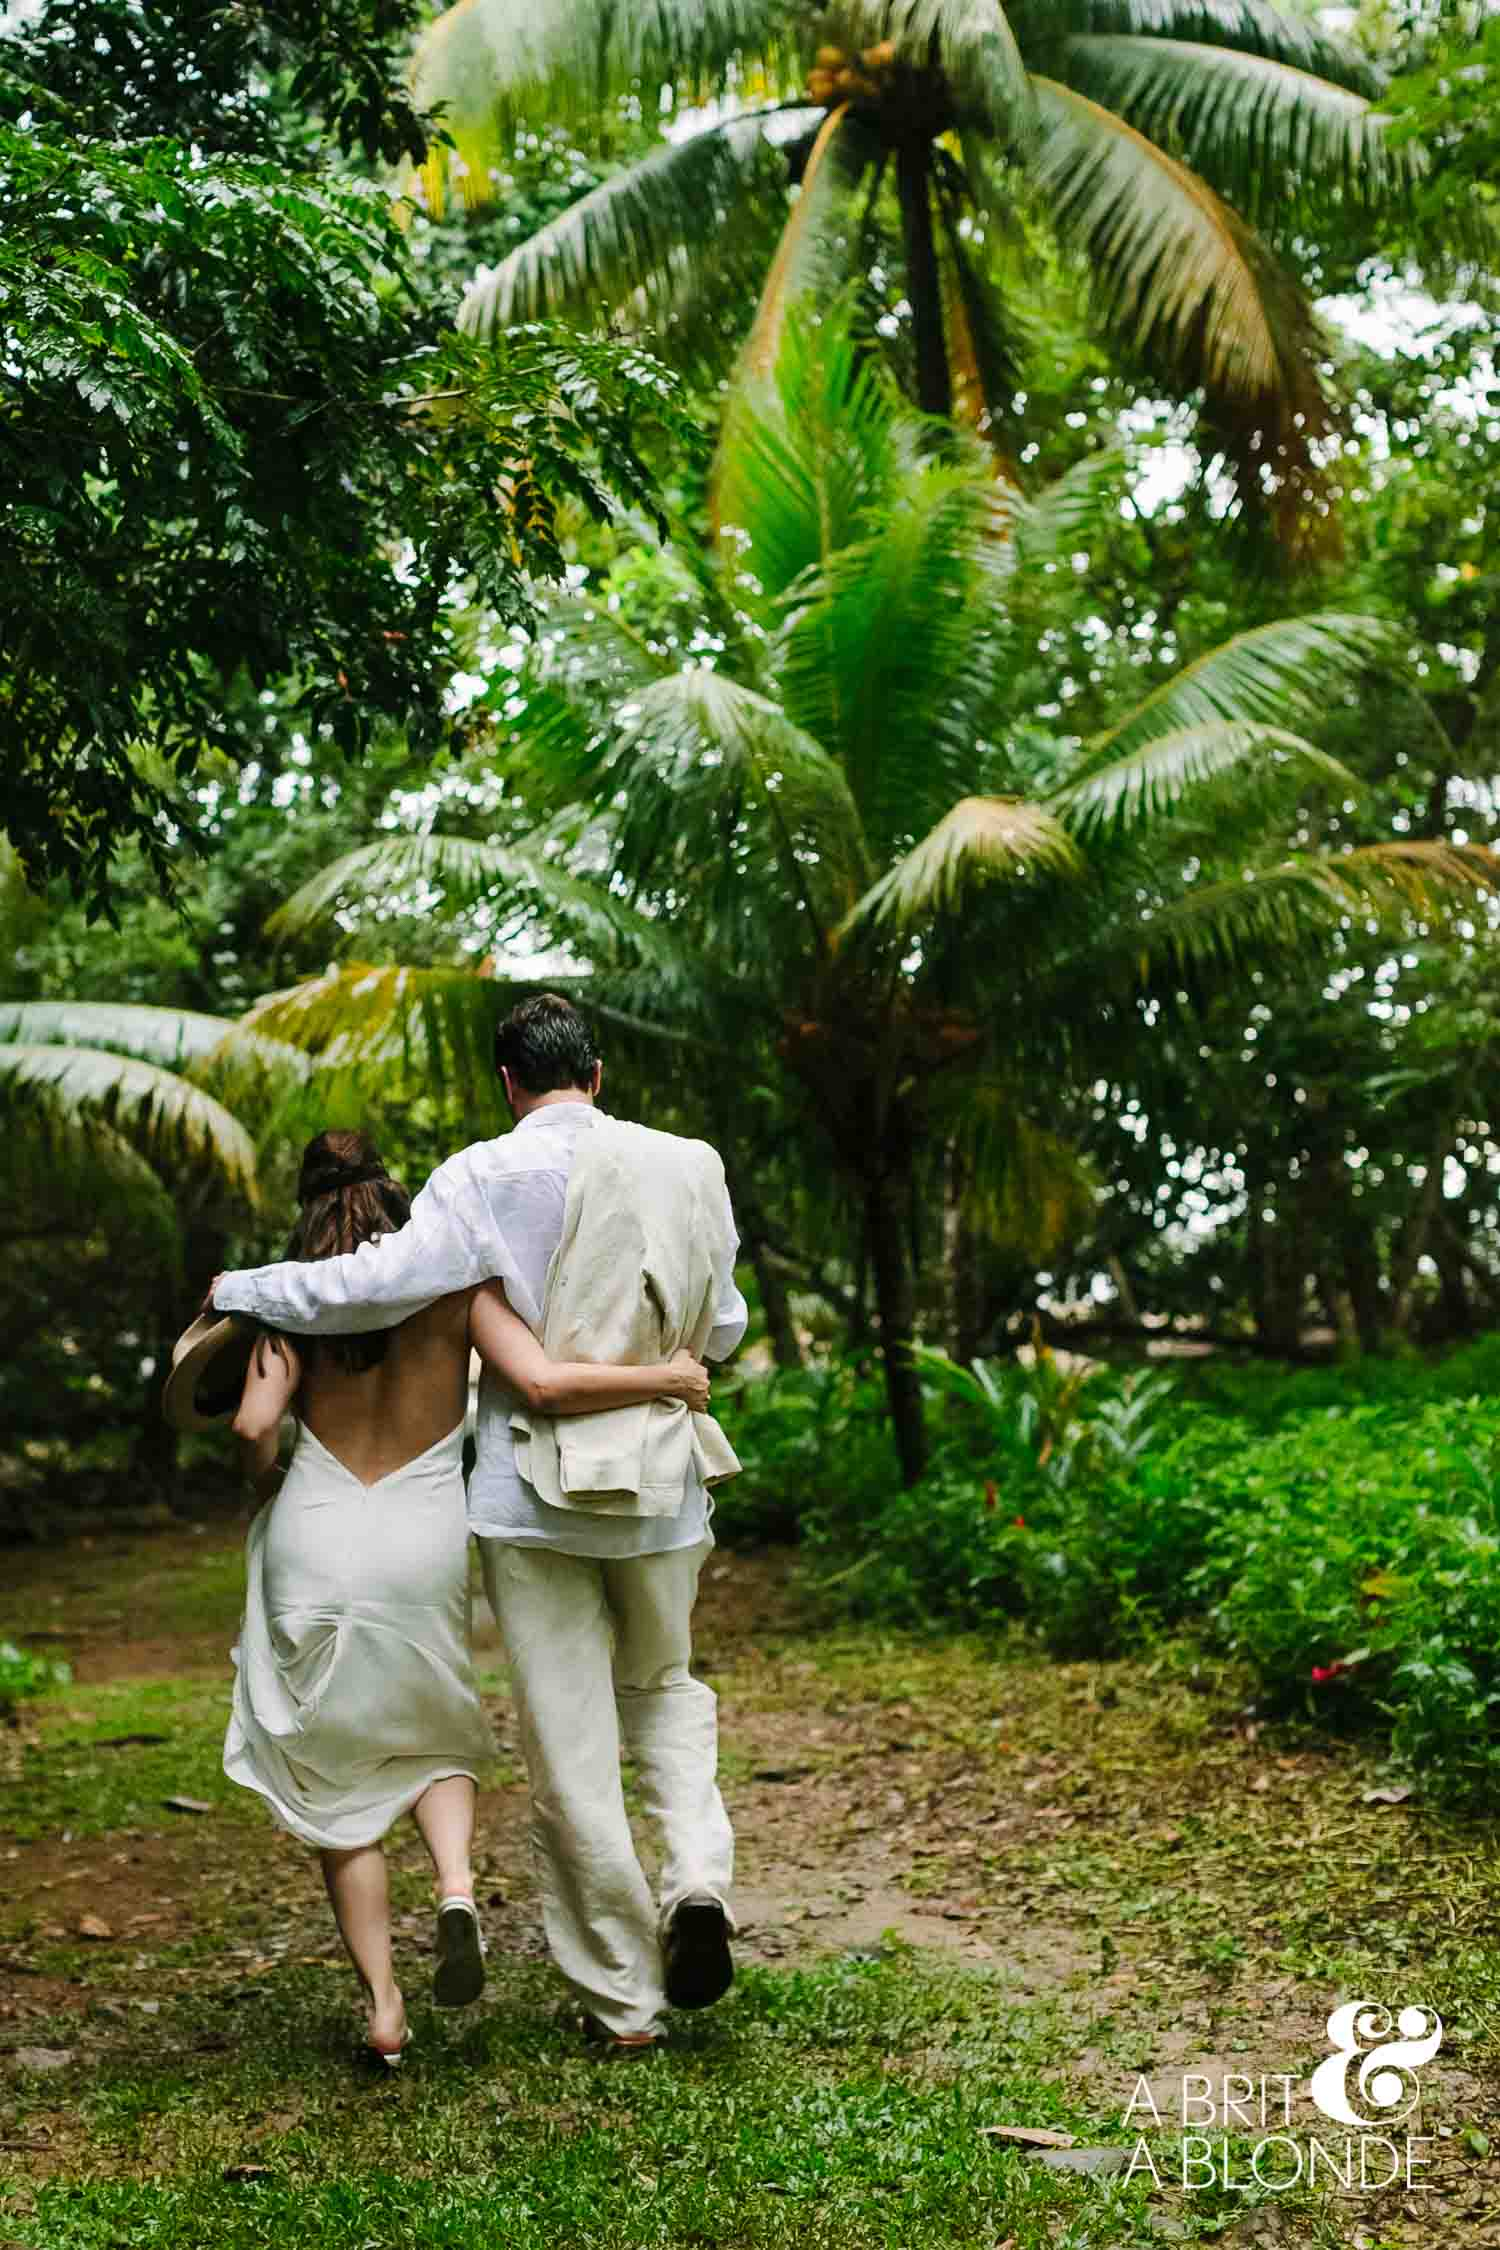 Costa rica weddings elopements honeymoon vista celestial for Weddings in costa rica